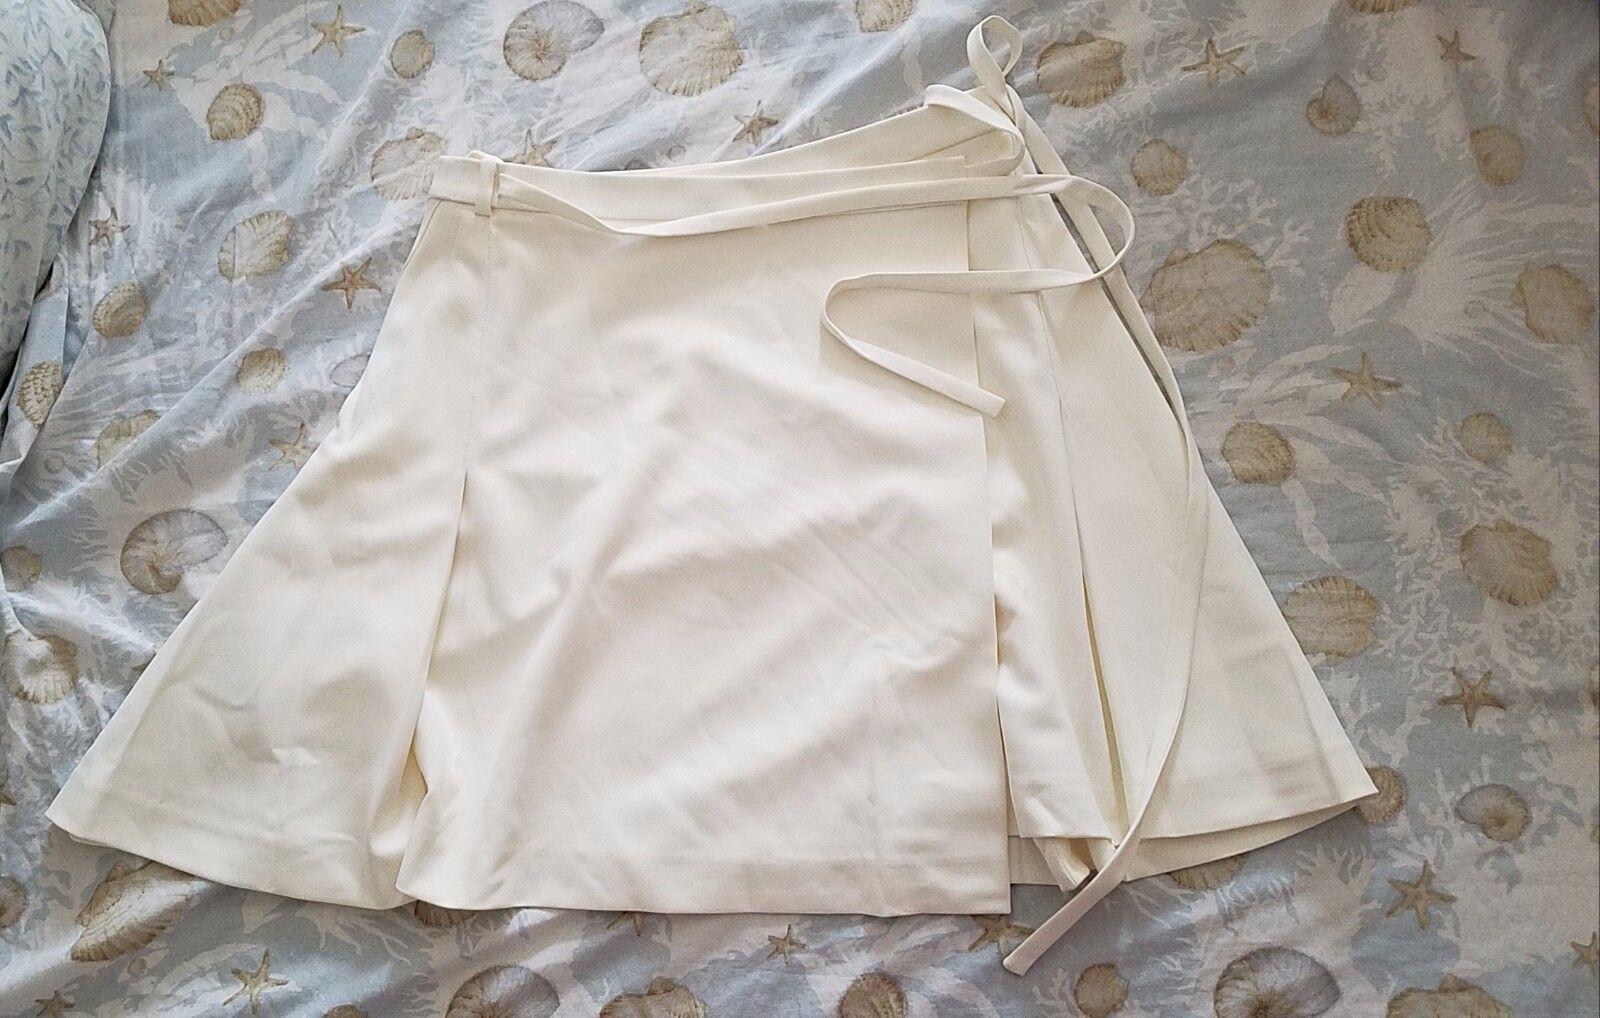 New T by Alexander Wang white wrap short skirt- Size 4 (adjustable waist)